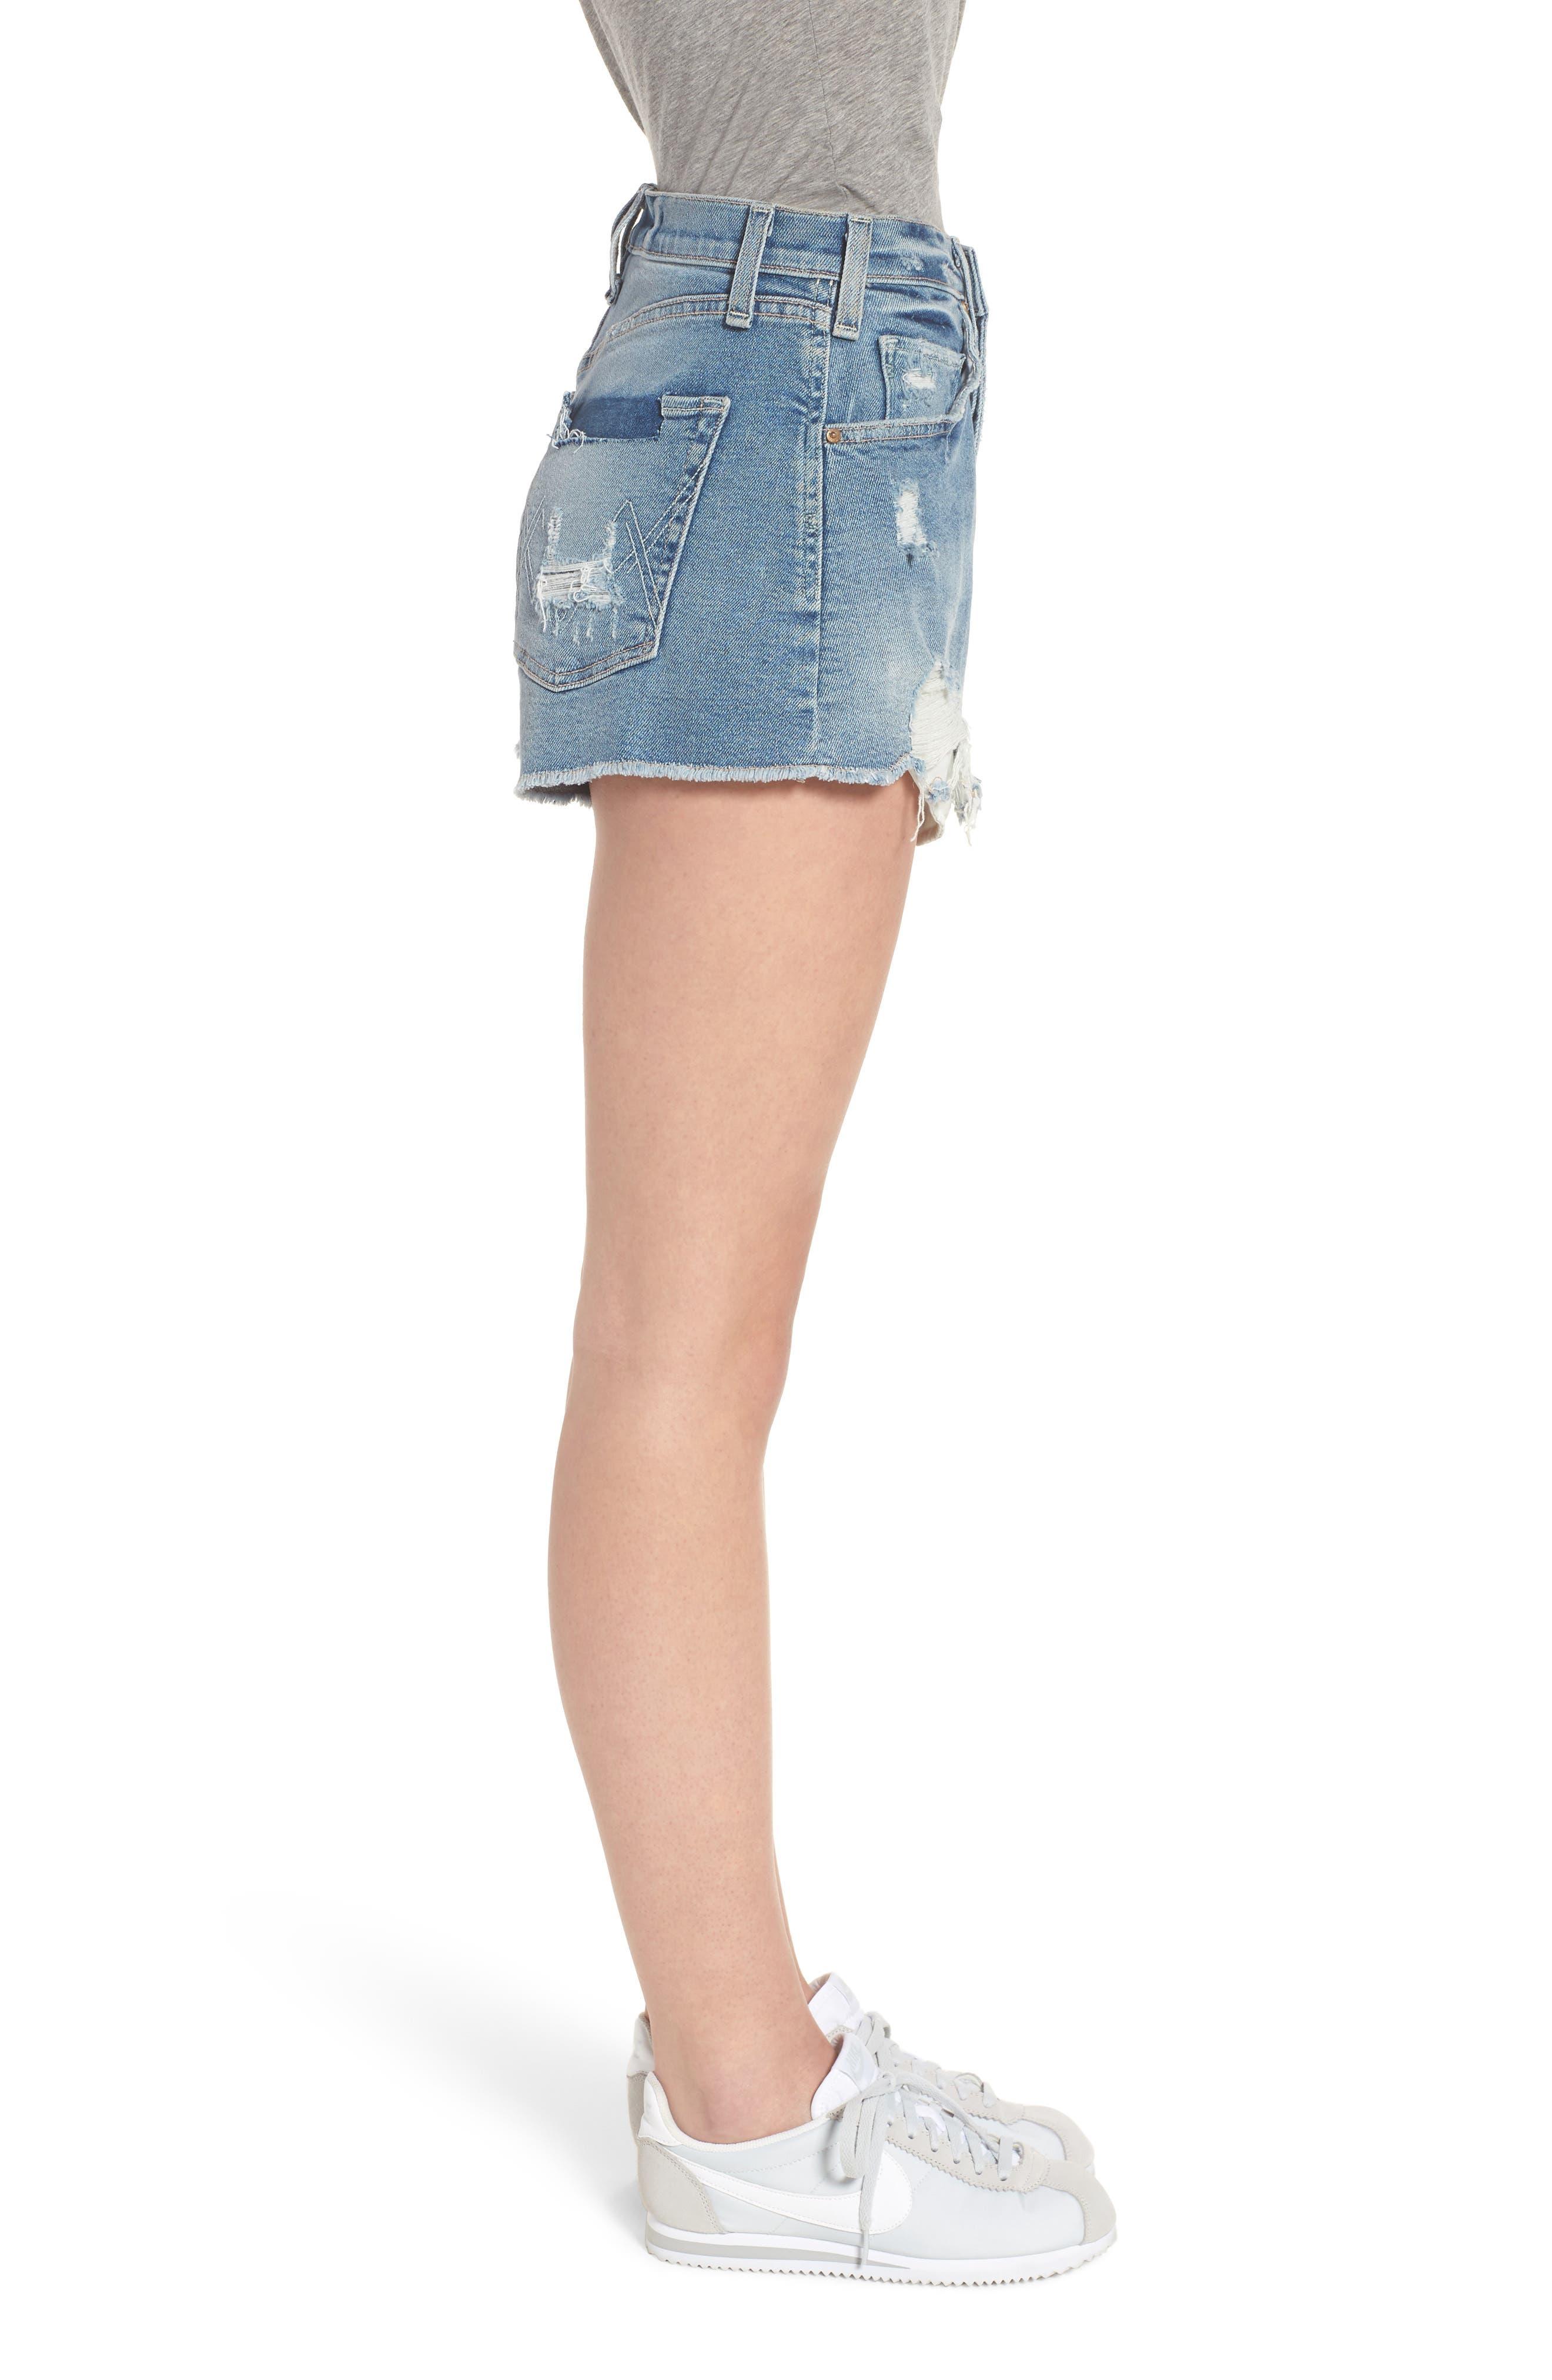 Georgia May Distressed Denim Shorts,                             Alternate thumbnail 3, color,                             450